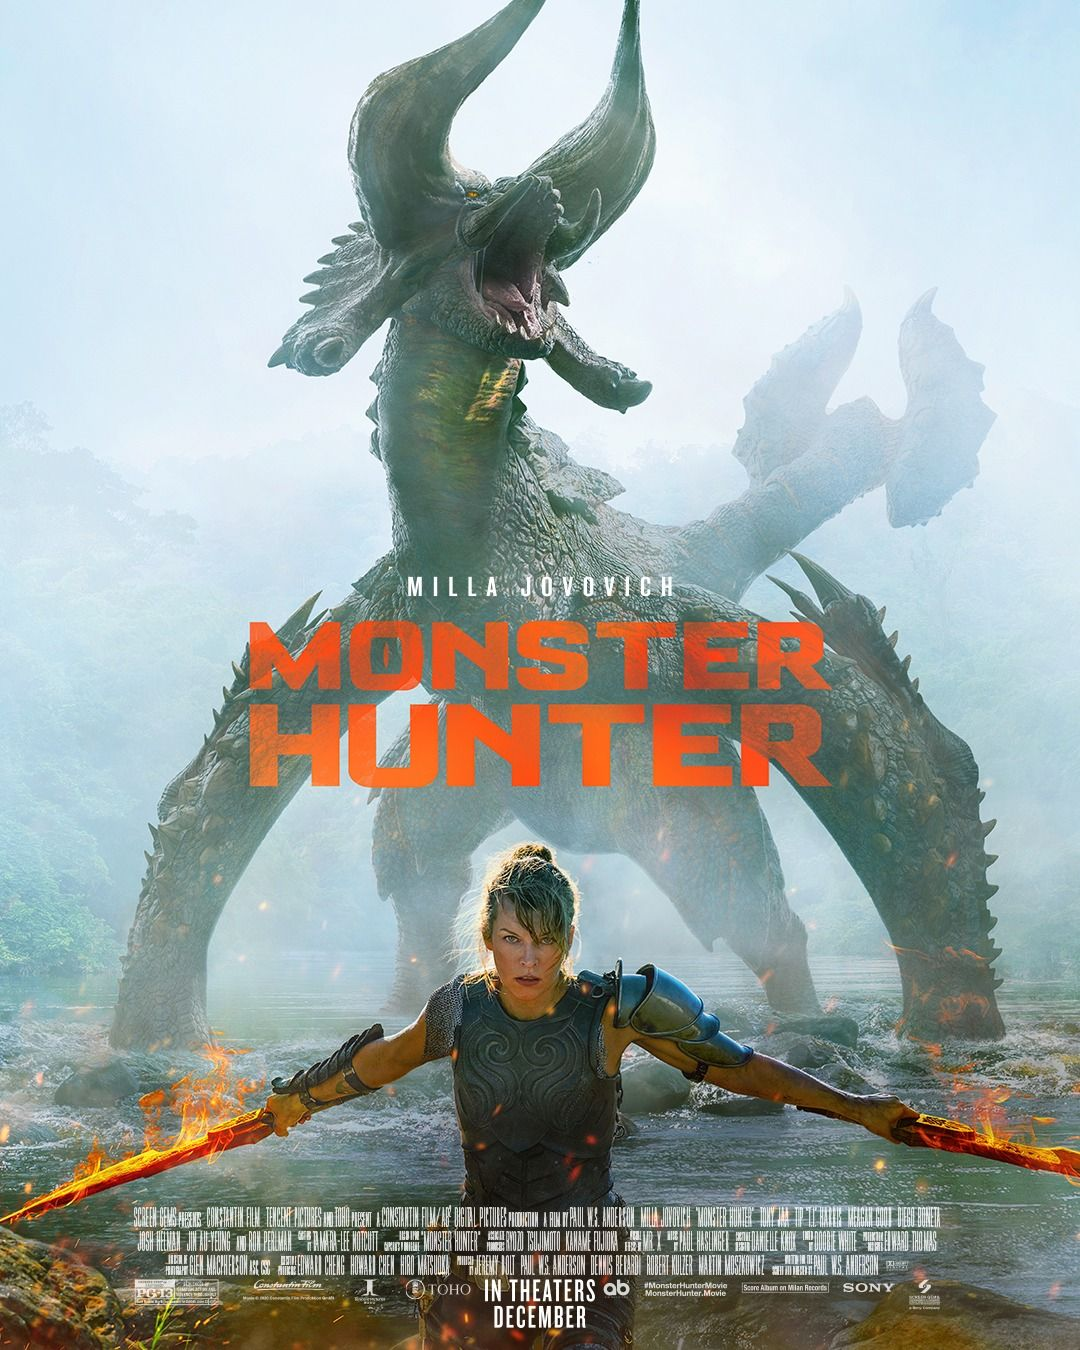 Monster Hunter Full Movie Trailer Https Www Dailymotion Com Video X7wtmub A World Unlike Any Other In 2020 Monster Hunter Monster Hunter Movie Hunter Movie